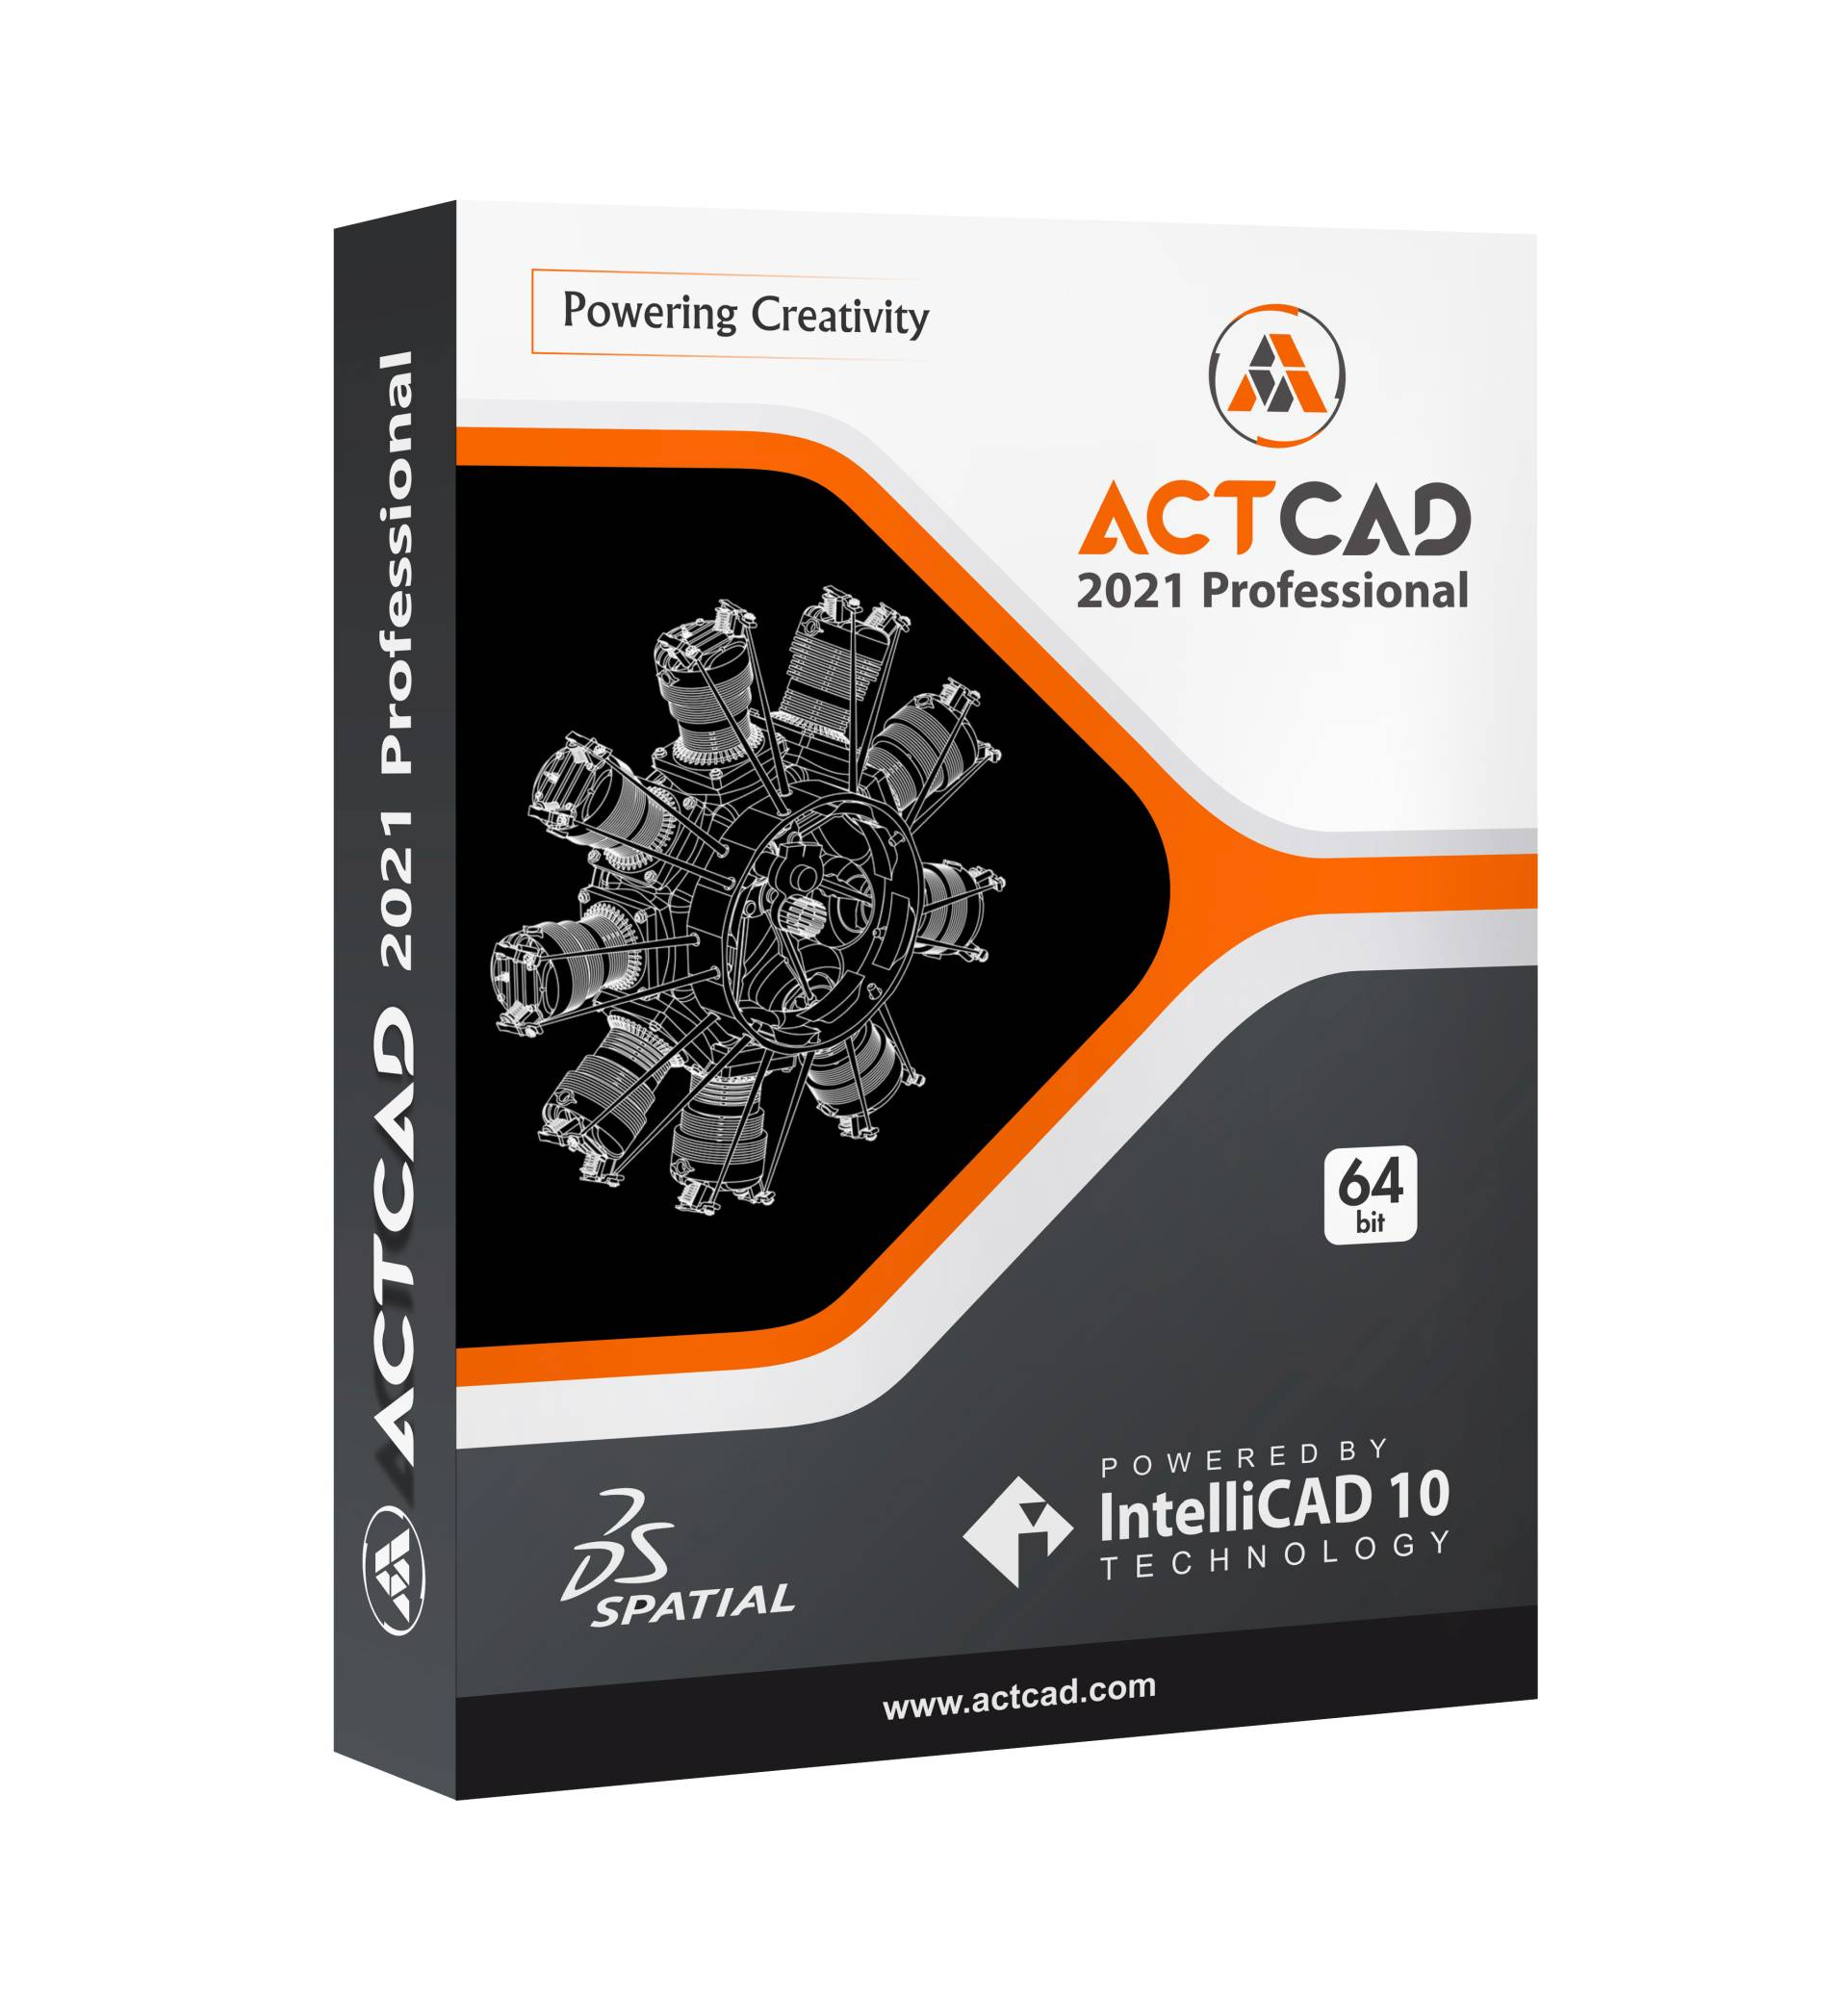 ActCAD 2021 PROFESSIONAL